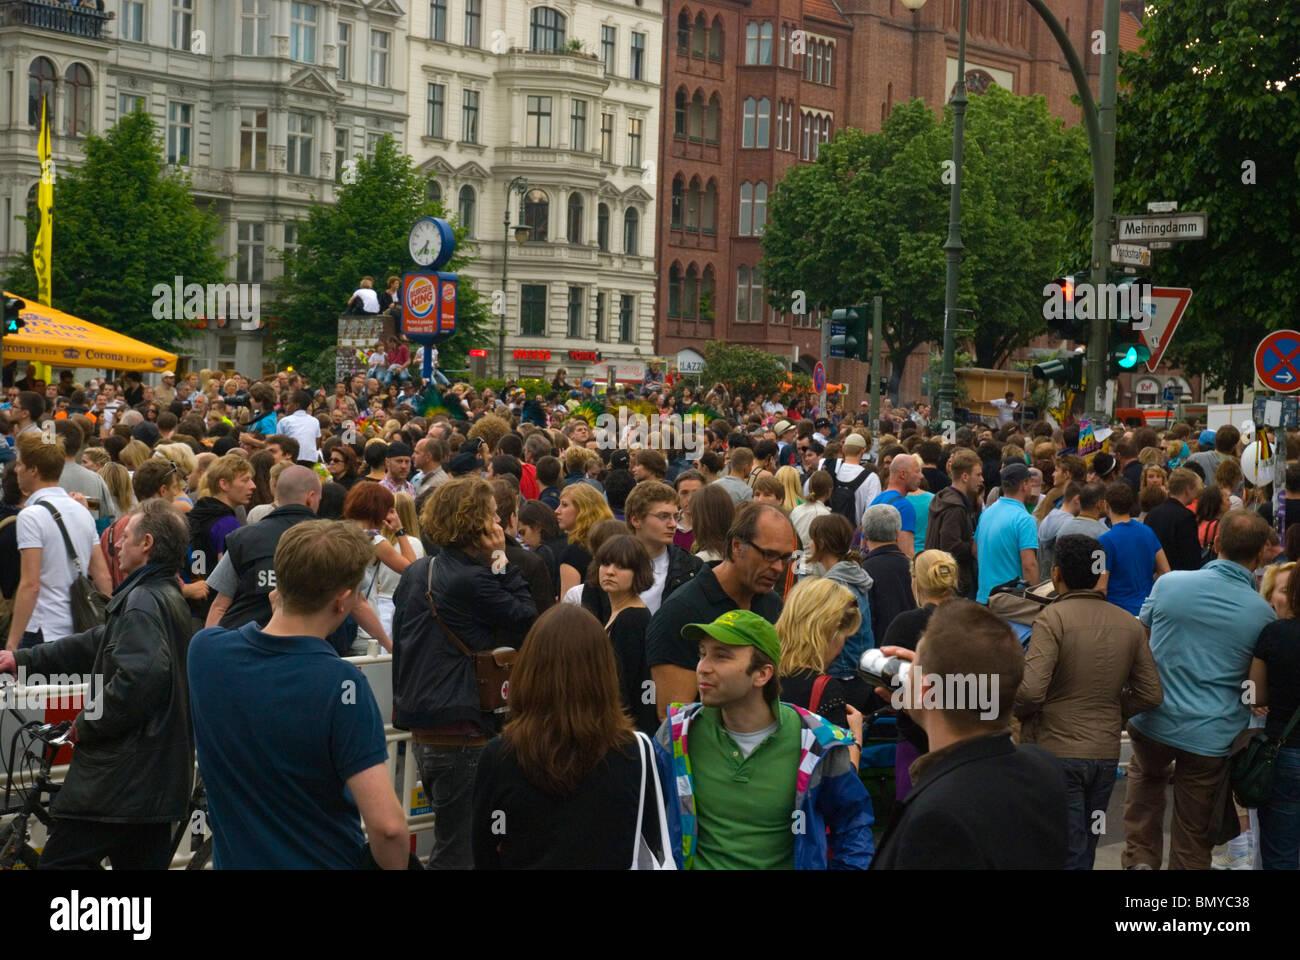 Karneval der Kulturen (Carnaval de las Culturas) festival callejero de Europa Alemania Berlín Kreuzberg Imagen De Stock